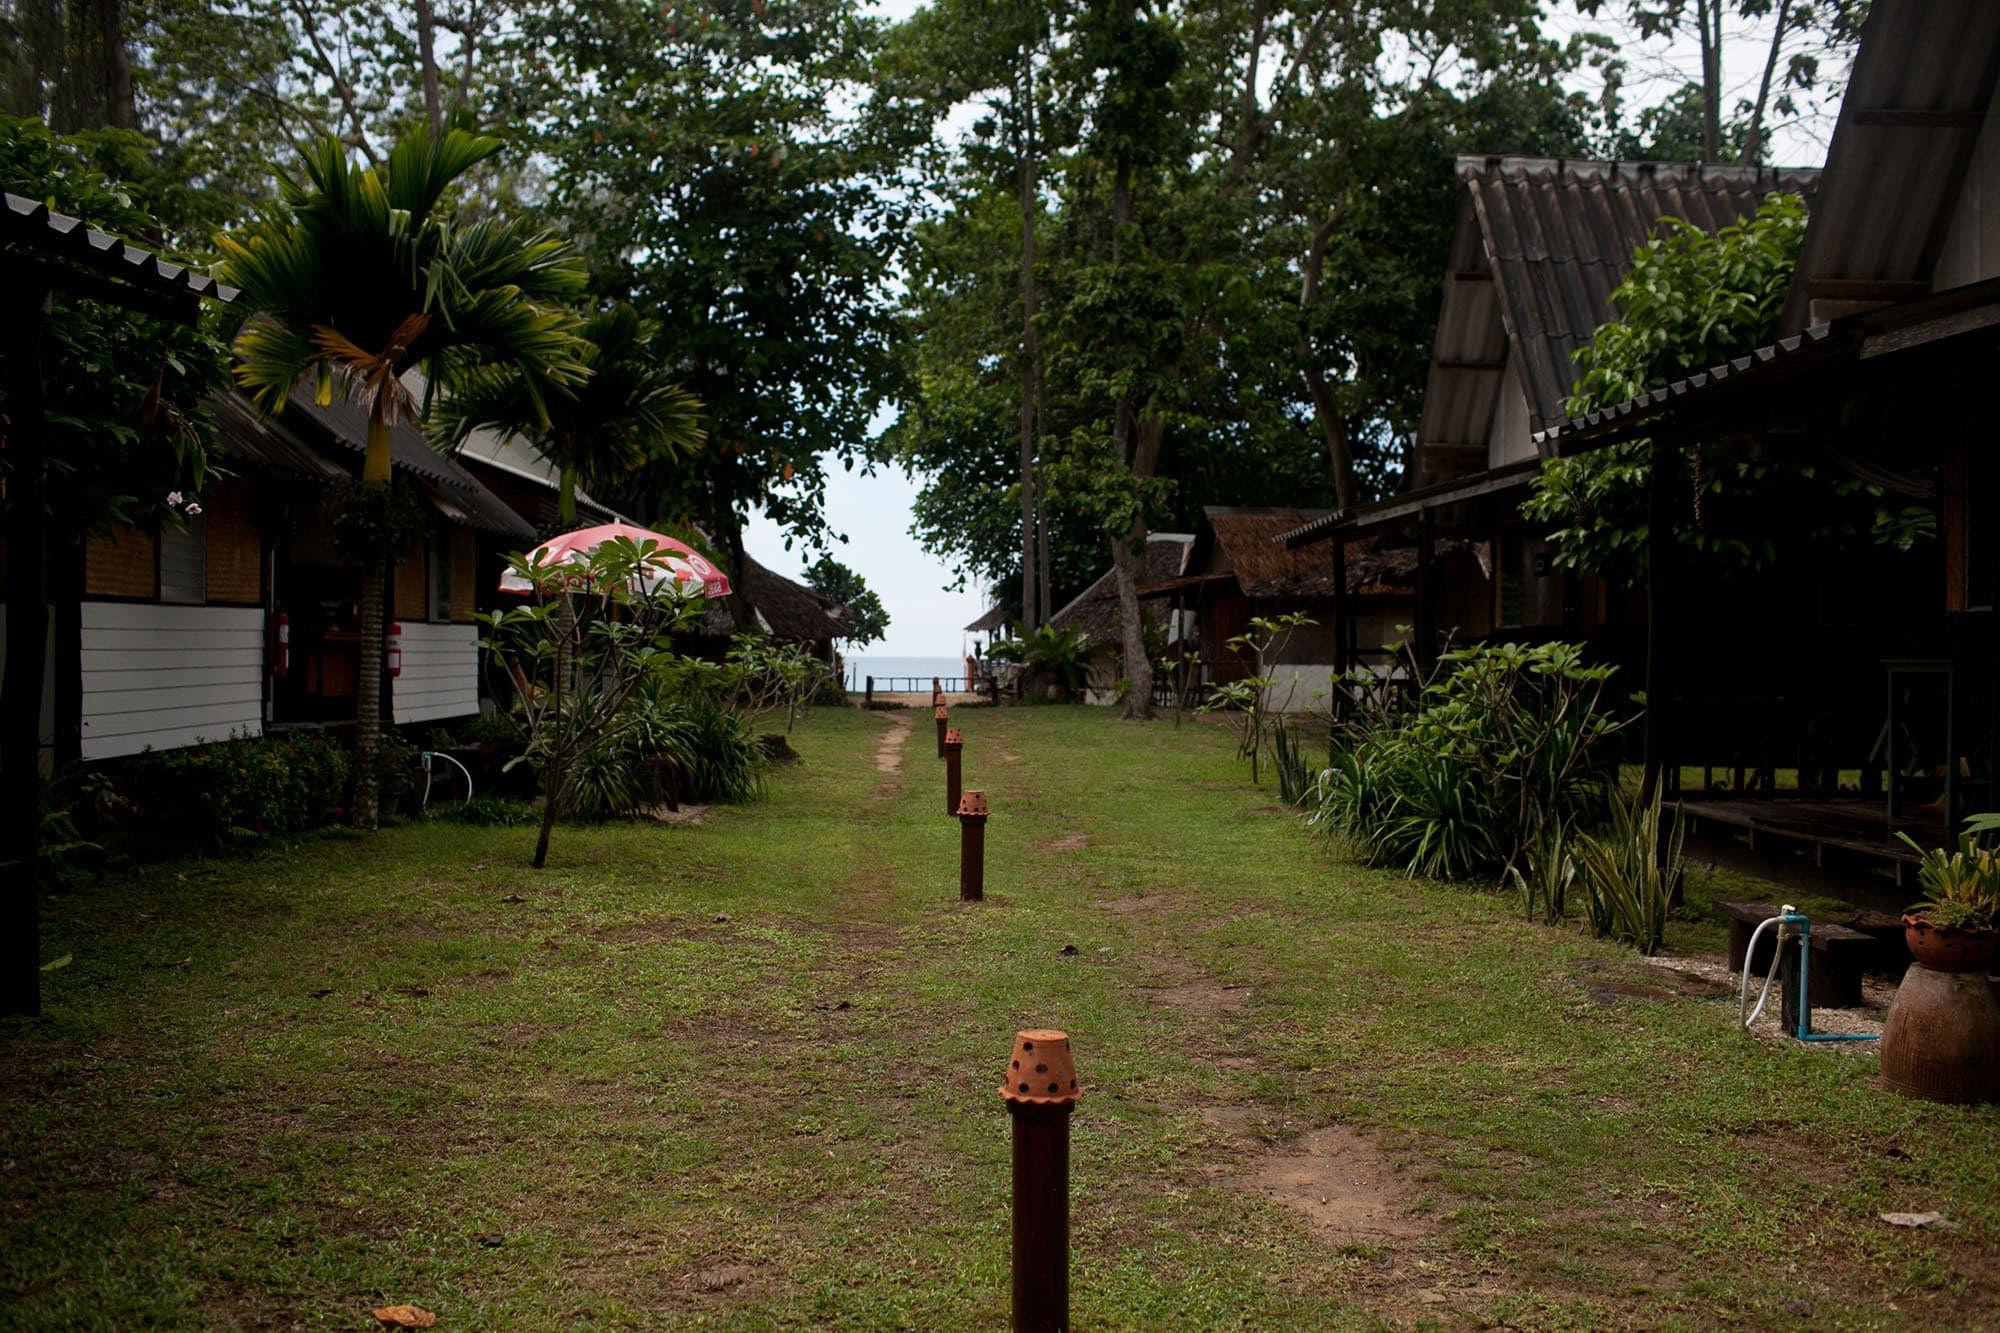 Our bungalow in paradise: Koh Lanta, Thailand